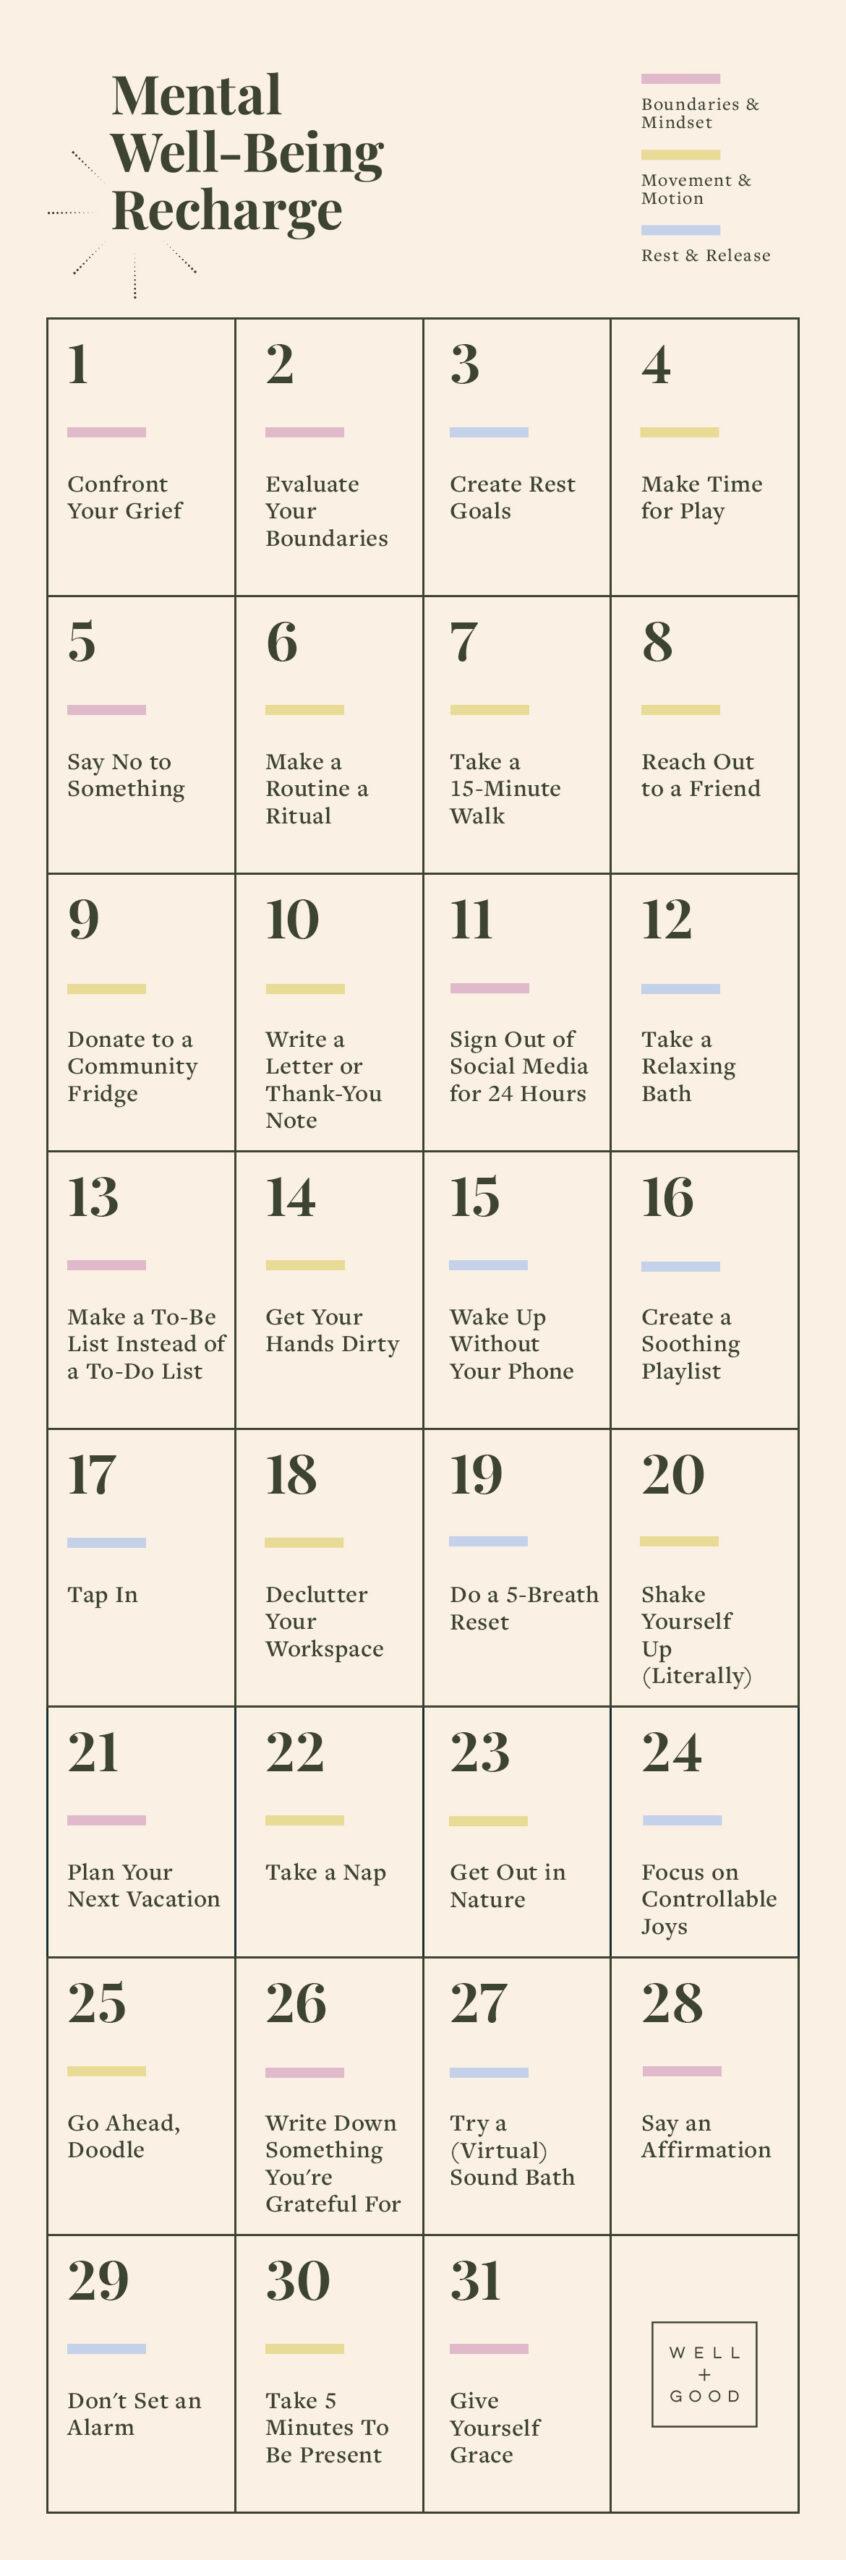 mental well-being recharge calendar